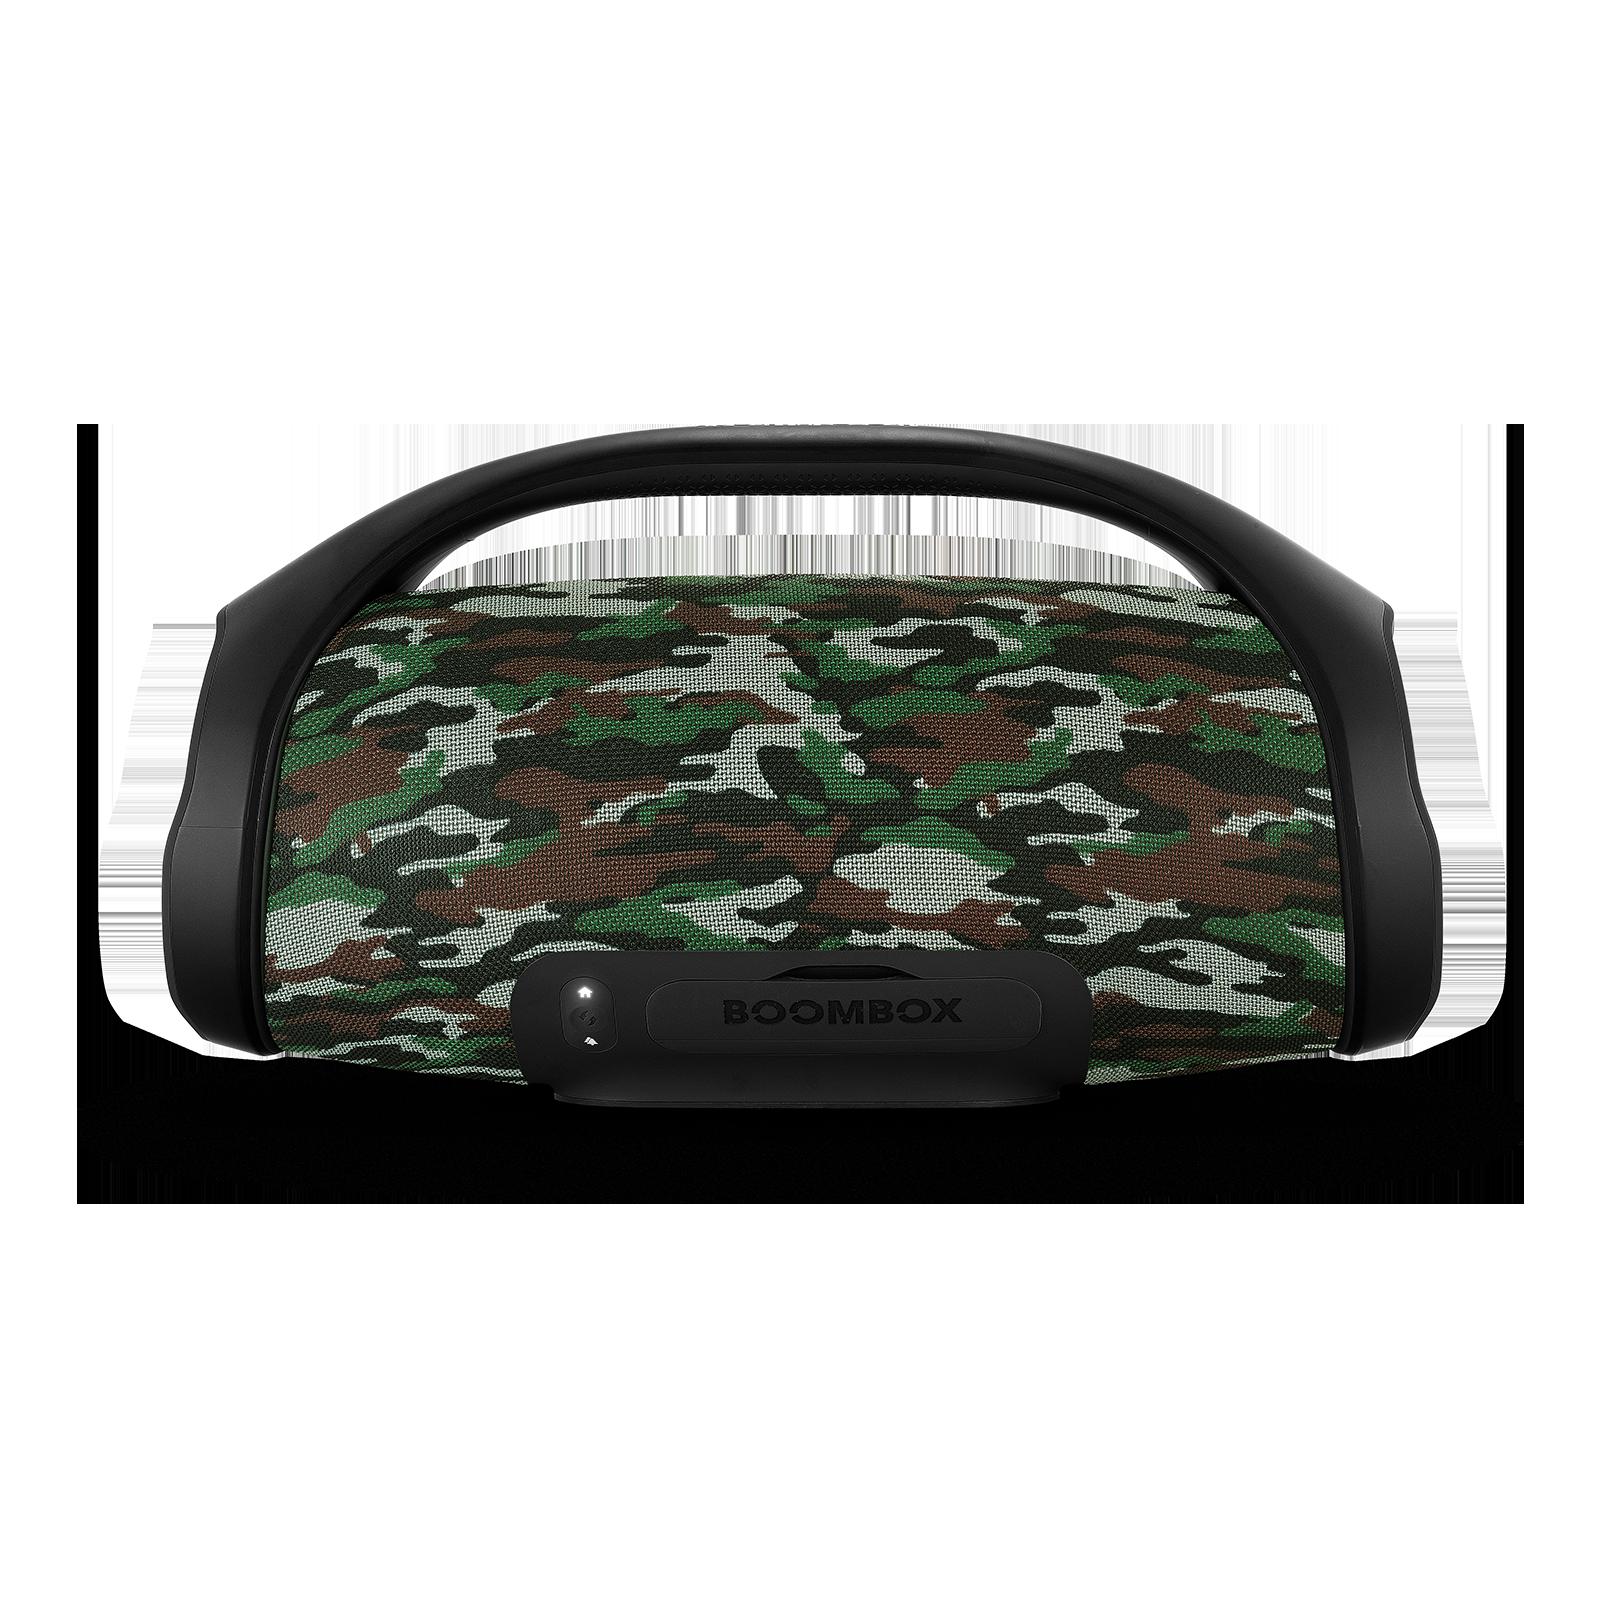 JBL Boombox - Squad - Portable Bluetooth Speaker - Back